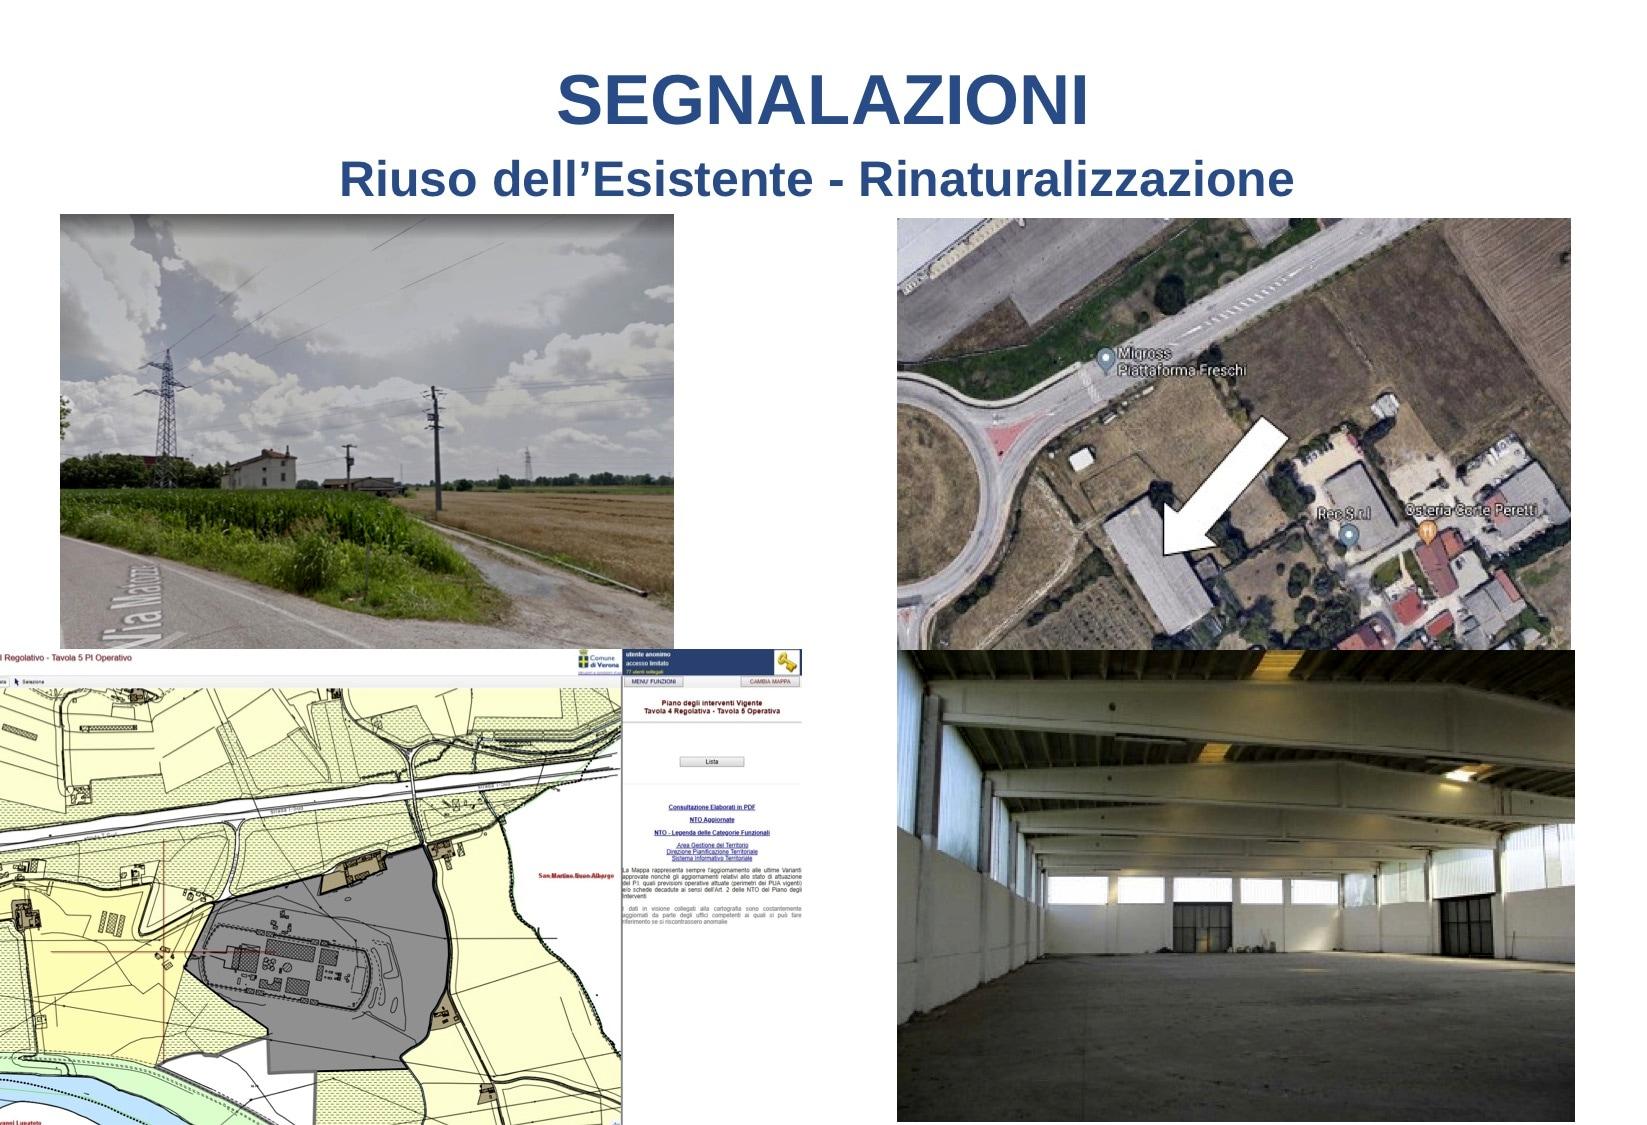 confindustriaSegnalazioniExtracted (1)2-2-2